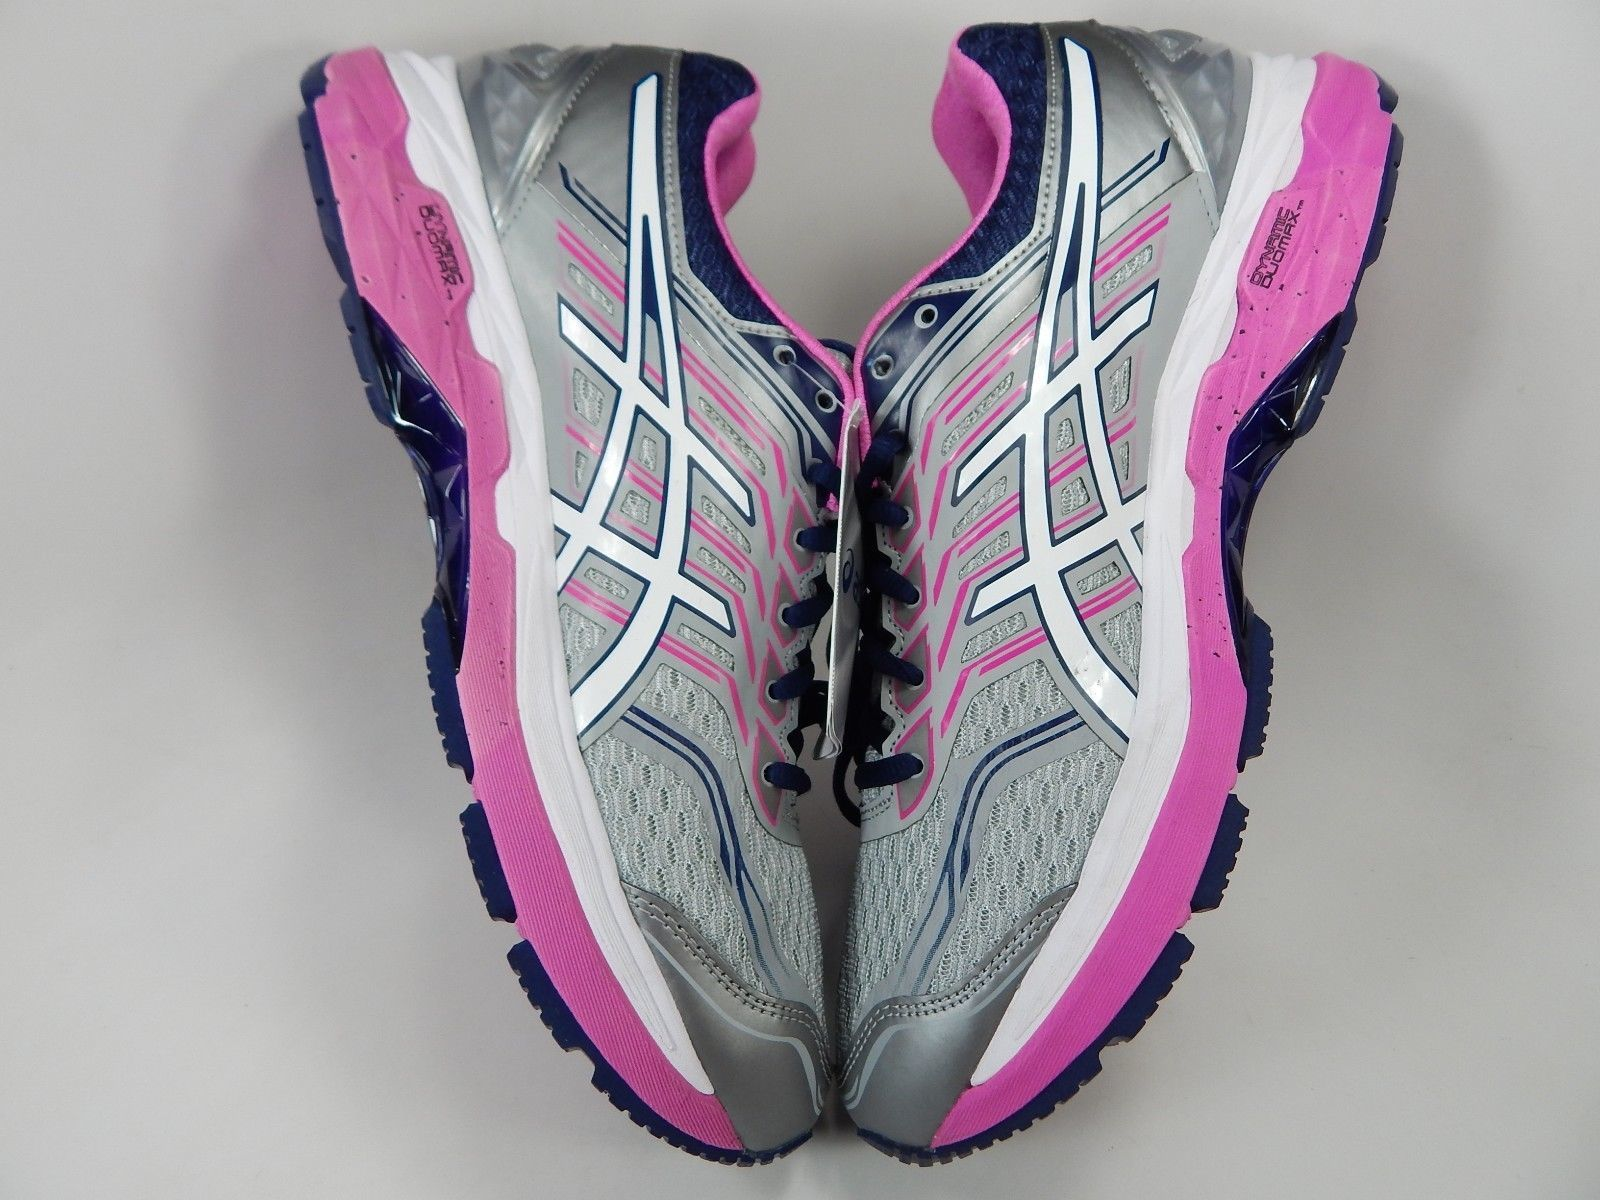 MISMATCH Asics GT 2000 v 5 Sz 11 2A NARROW Left & 11.5 M (B) Right Women's Shoes